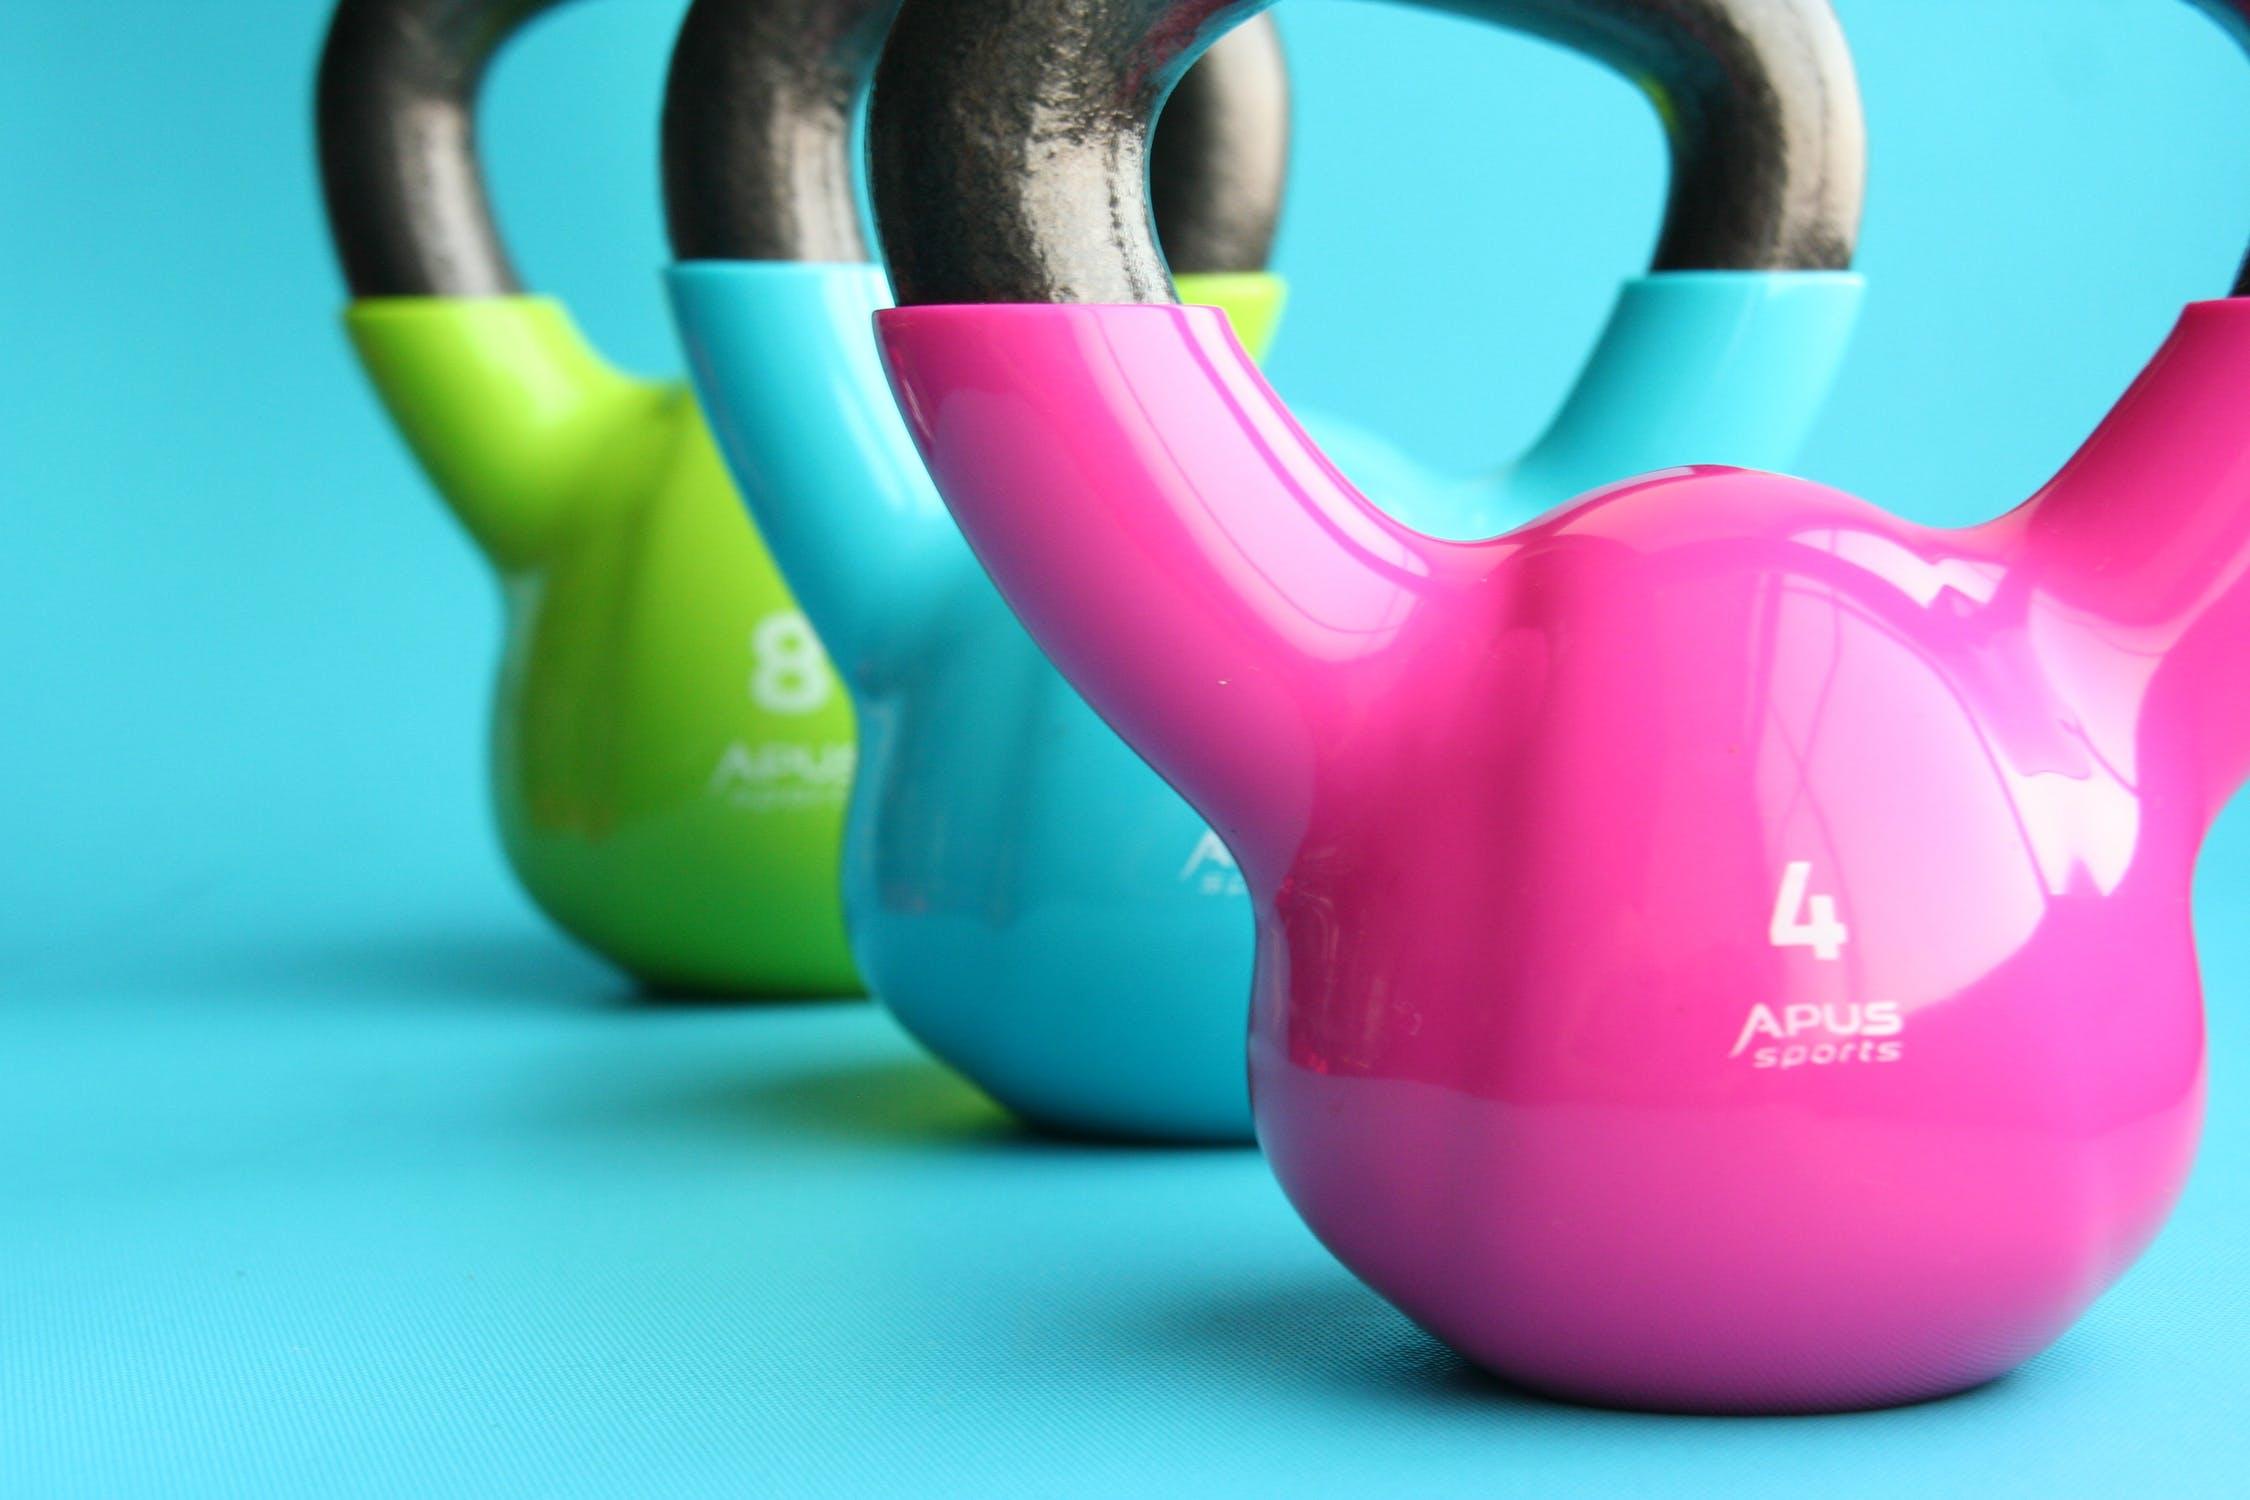 resolution fitness|resolution-fitness|fitness-new-years-resoltution